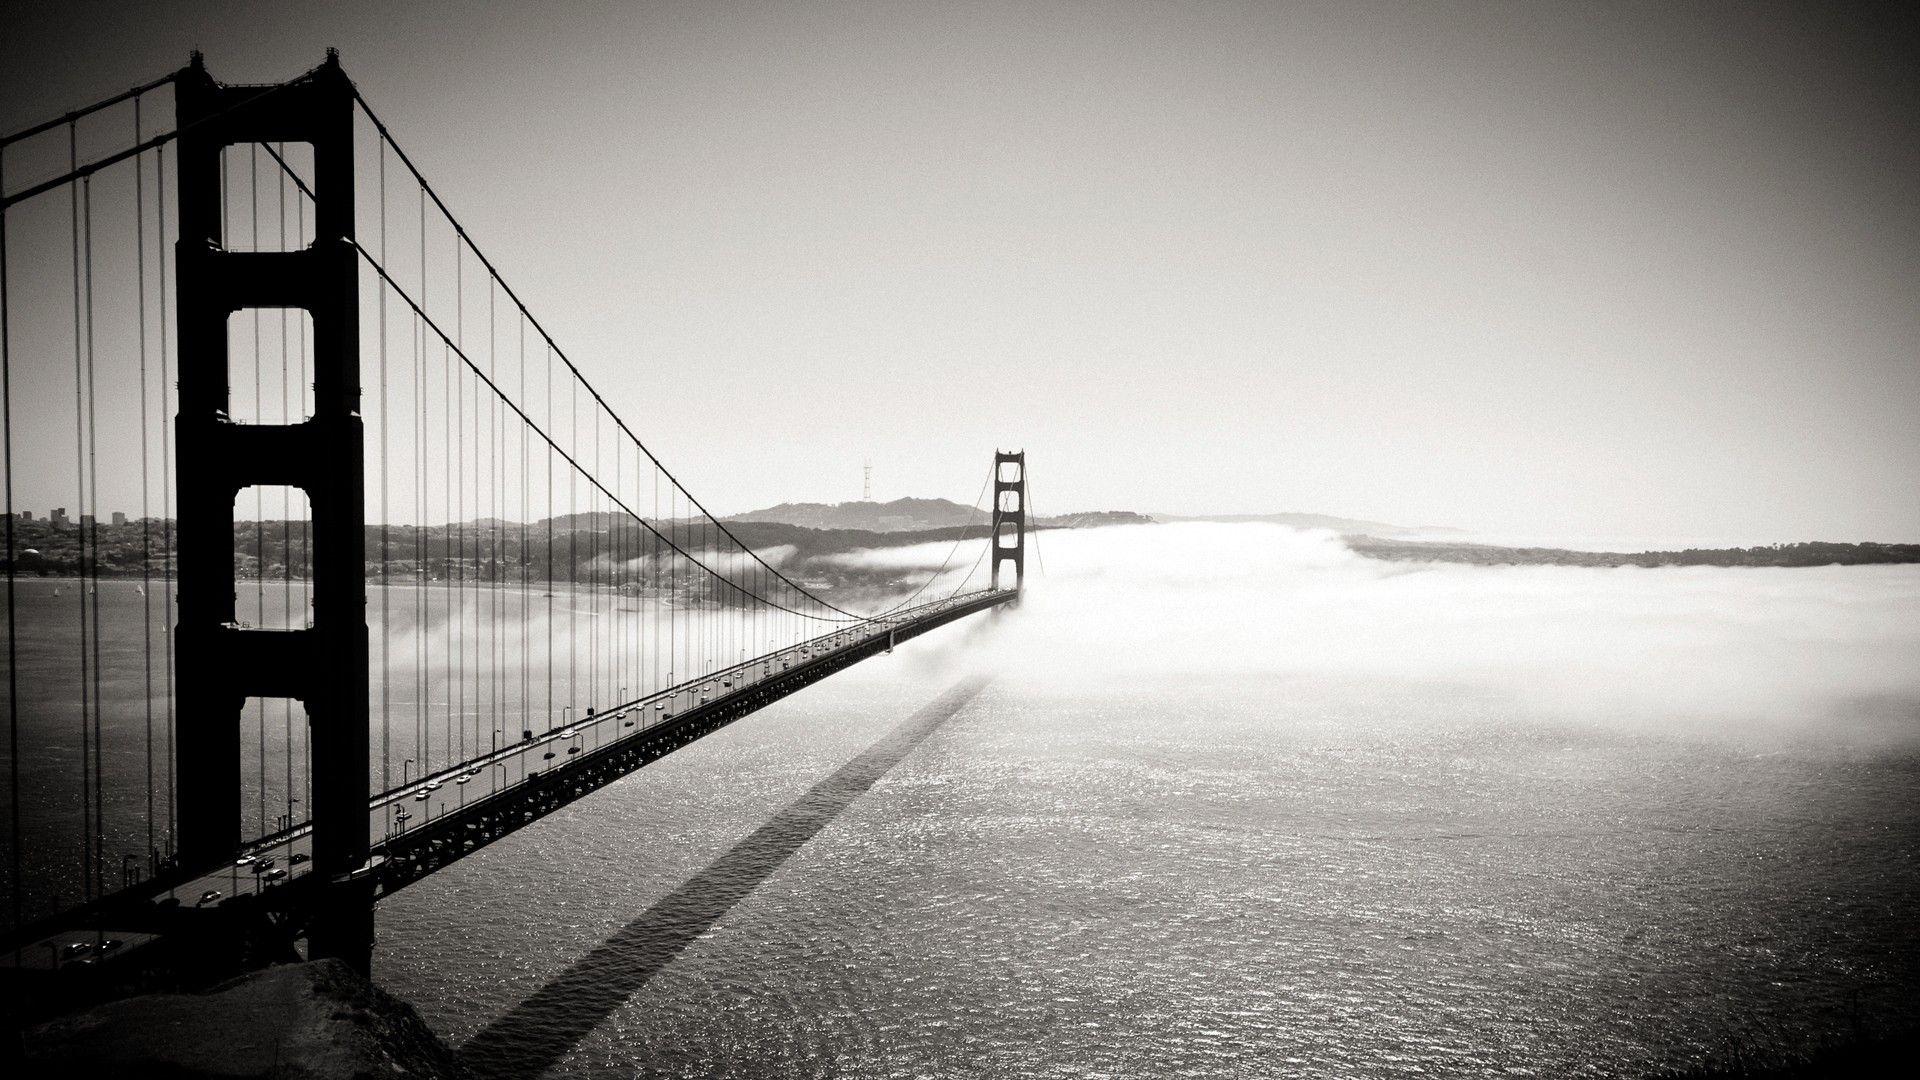 Golden Gate Bridge Fog HD Desktop Wallpaper for K Ultra HD TV